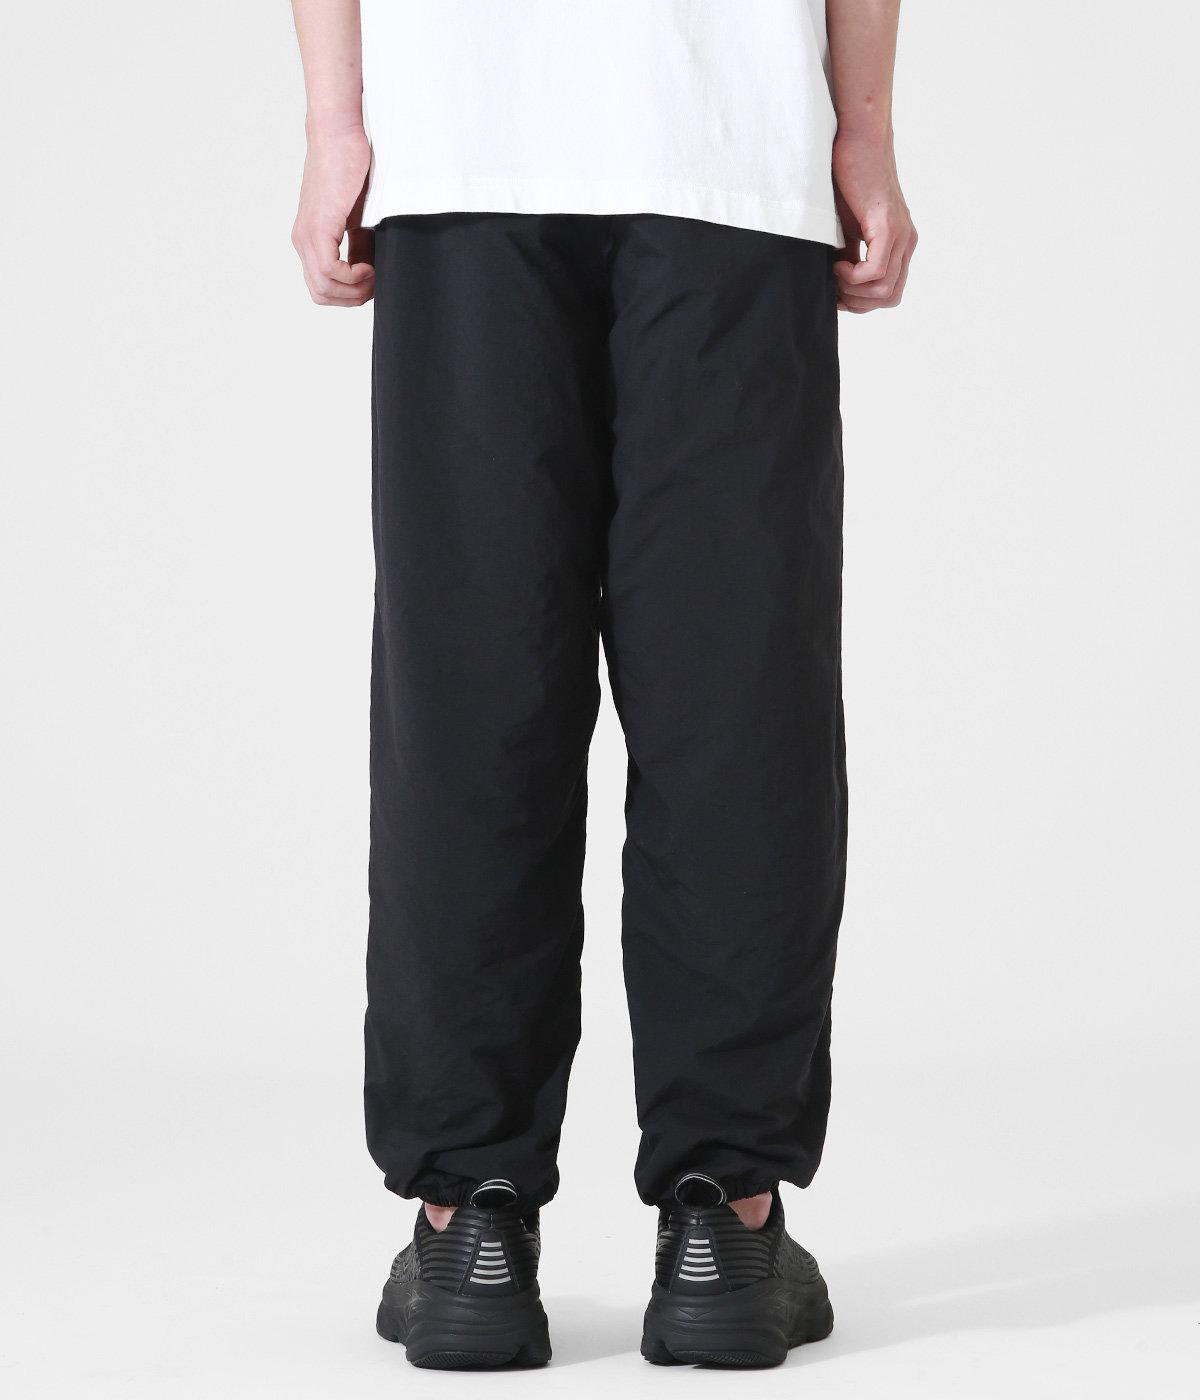 Versatile Nomad Pant